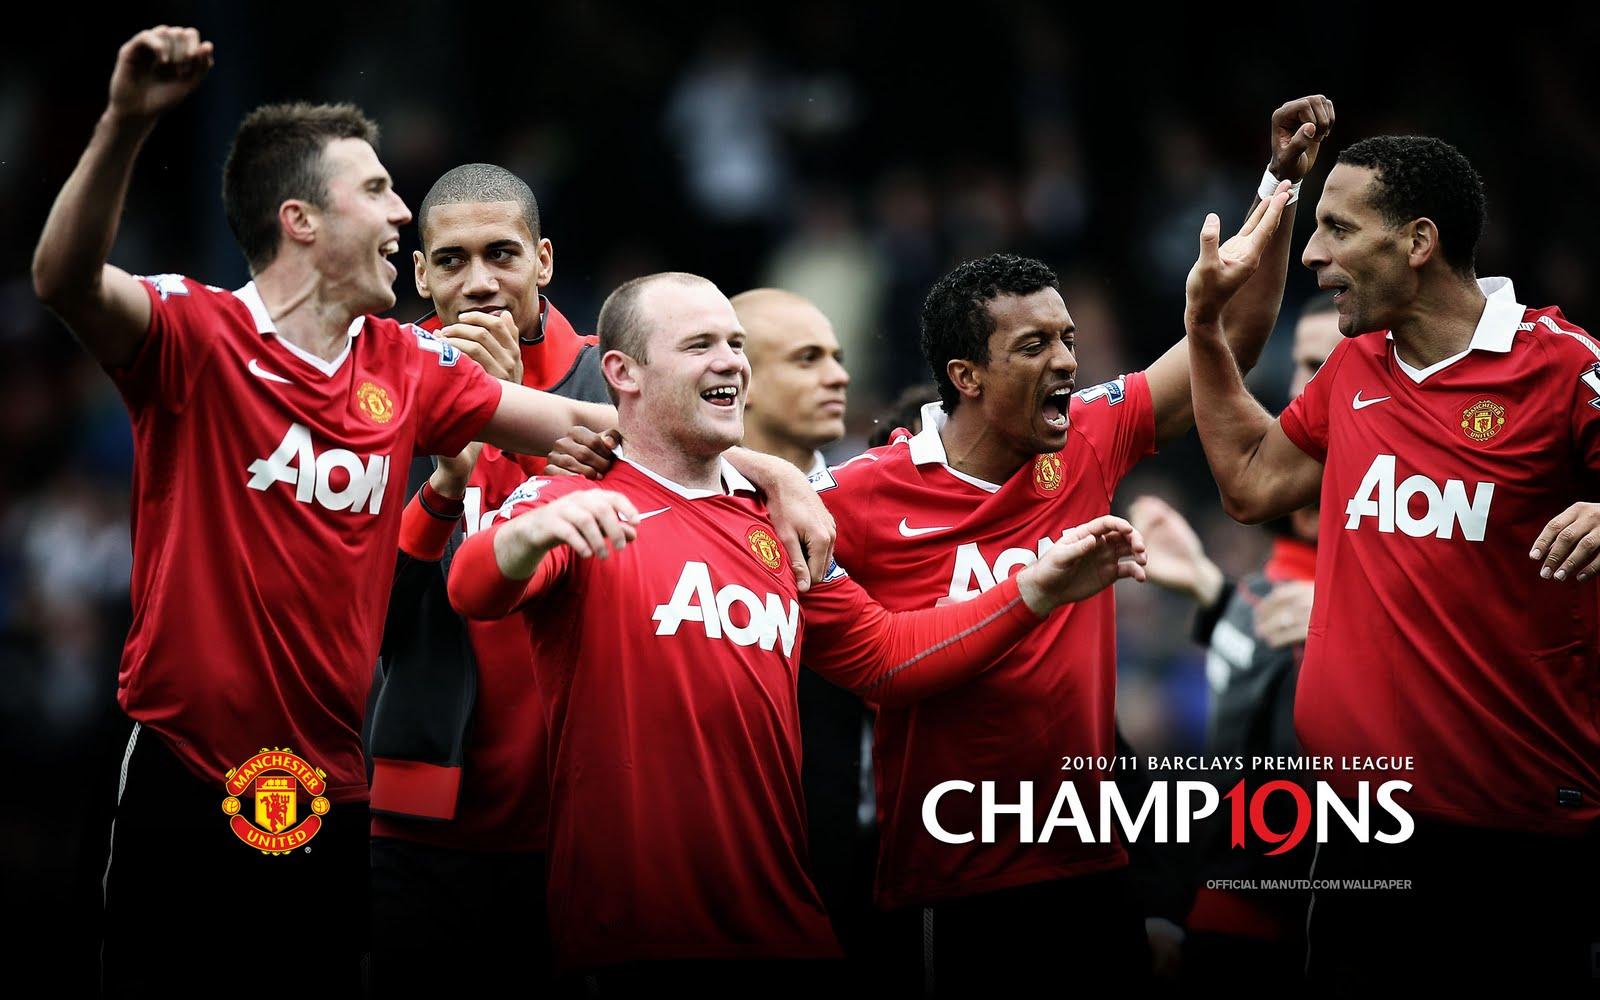 Man Utd 2010/11 Barclays Premier League Champion Man United | Malaysia ...